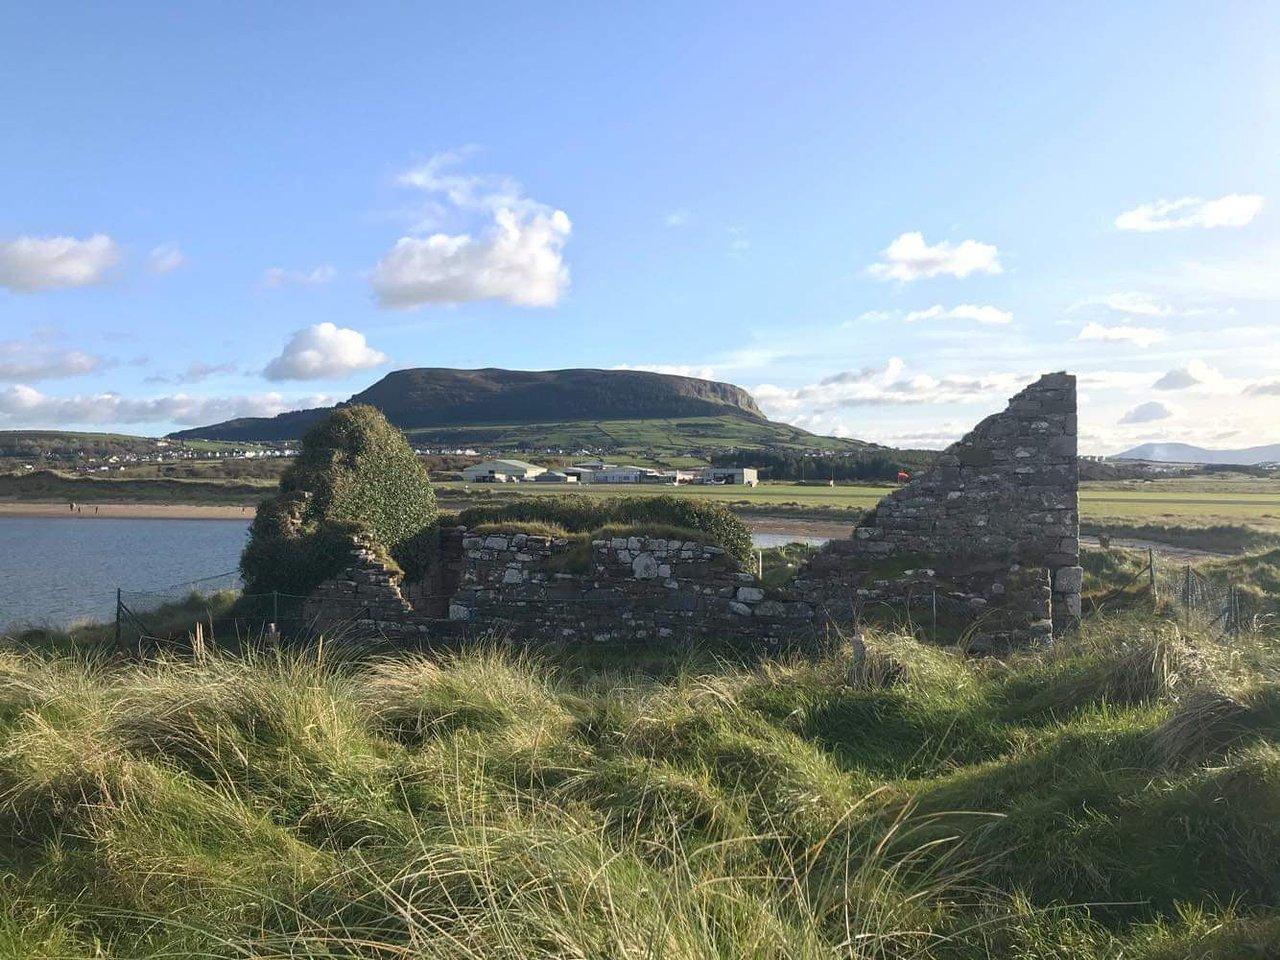 Christian Dating Site for Marriage in Sligo, Ireland